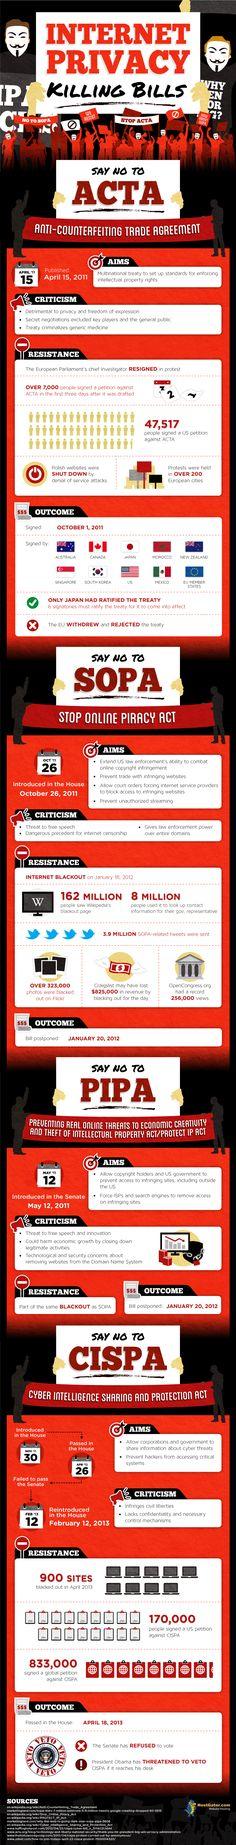 http://ajiboye.digimkts.com  Need a web host  Infographic: Internet Privacy, Killing Bills | HostGator Web Hosting Blog | Gator Crossing